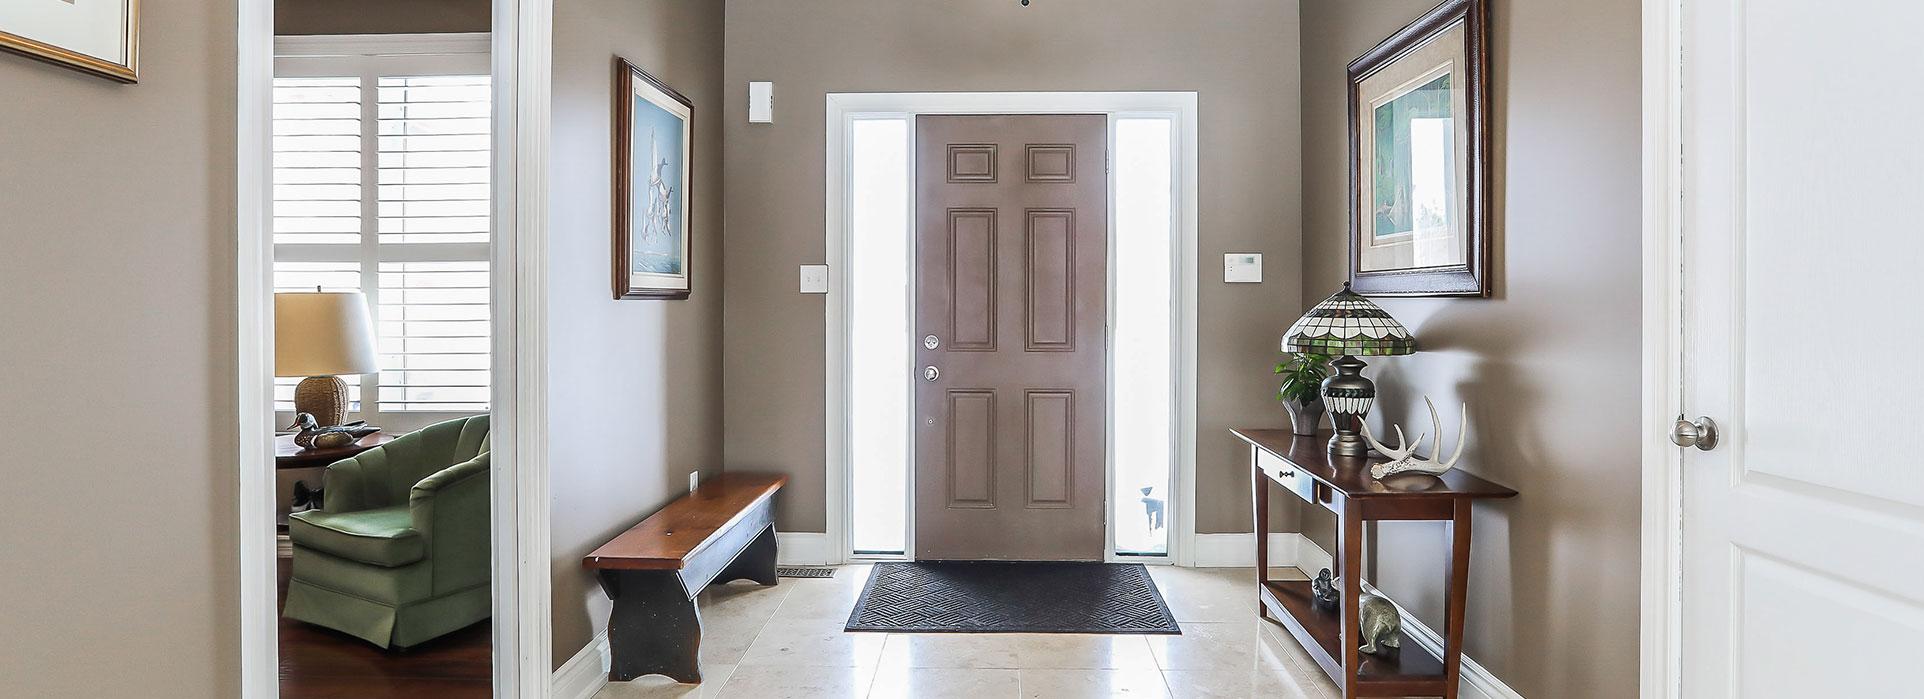 29 Merrington Avenue - Front Entrance - Cripps Realty